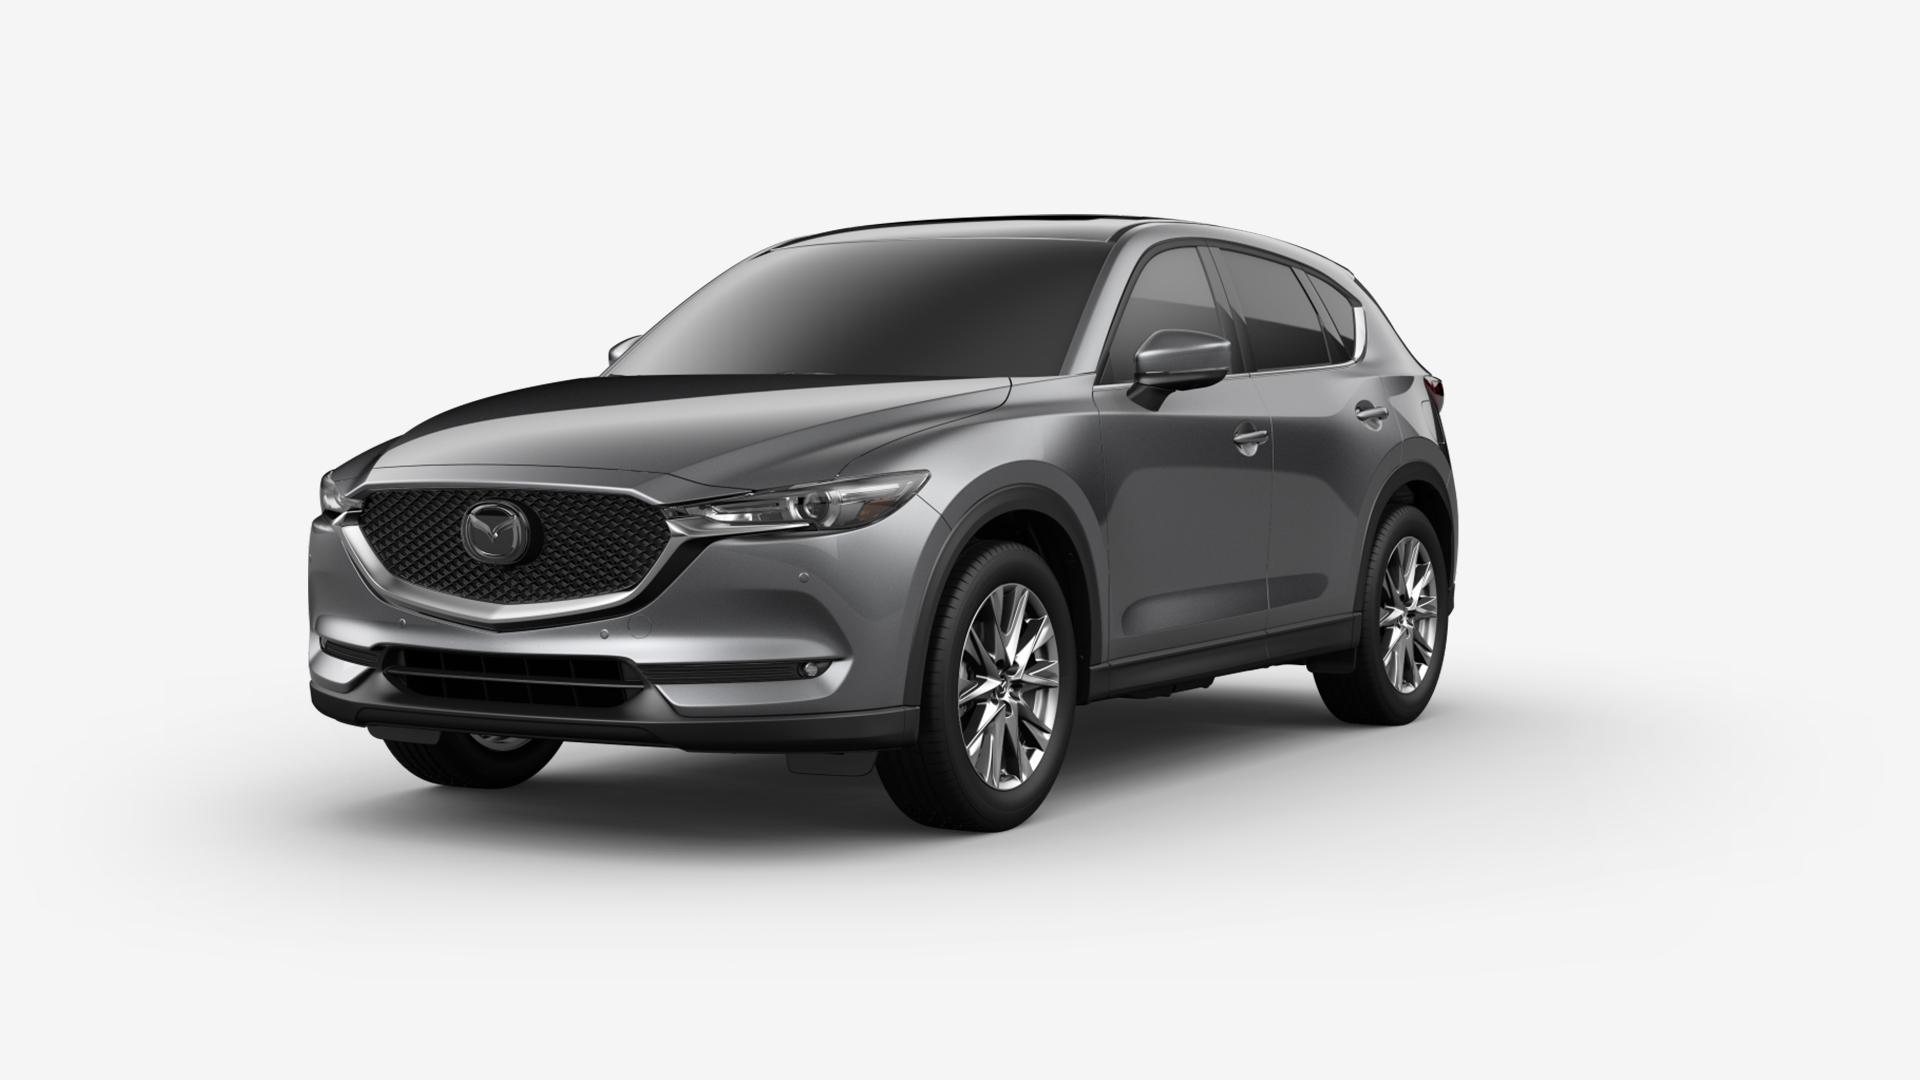 Kekurangan Mazda Cx 5 Harga